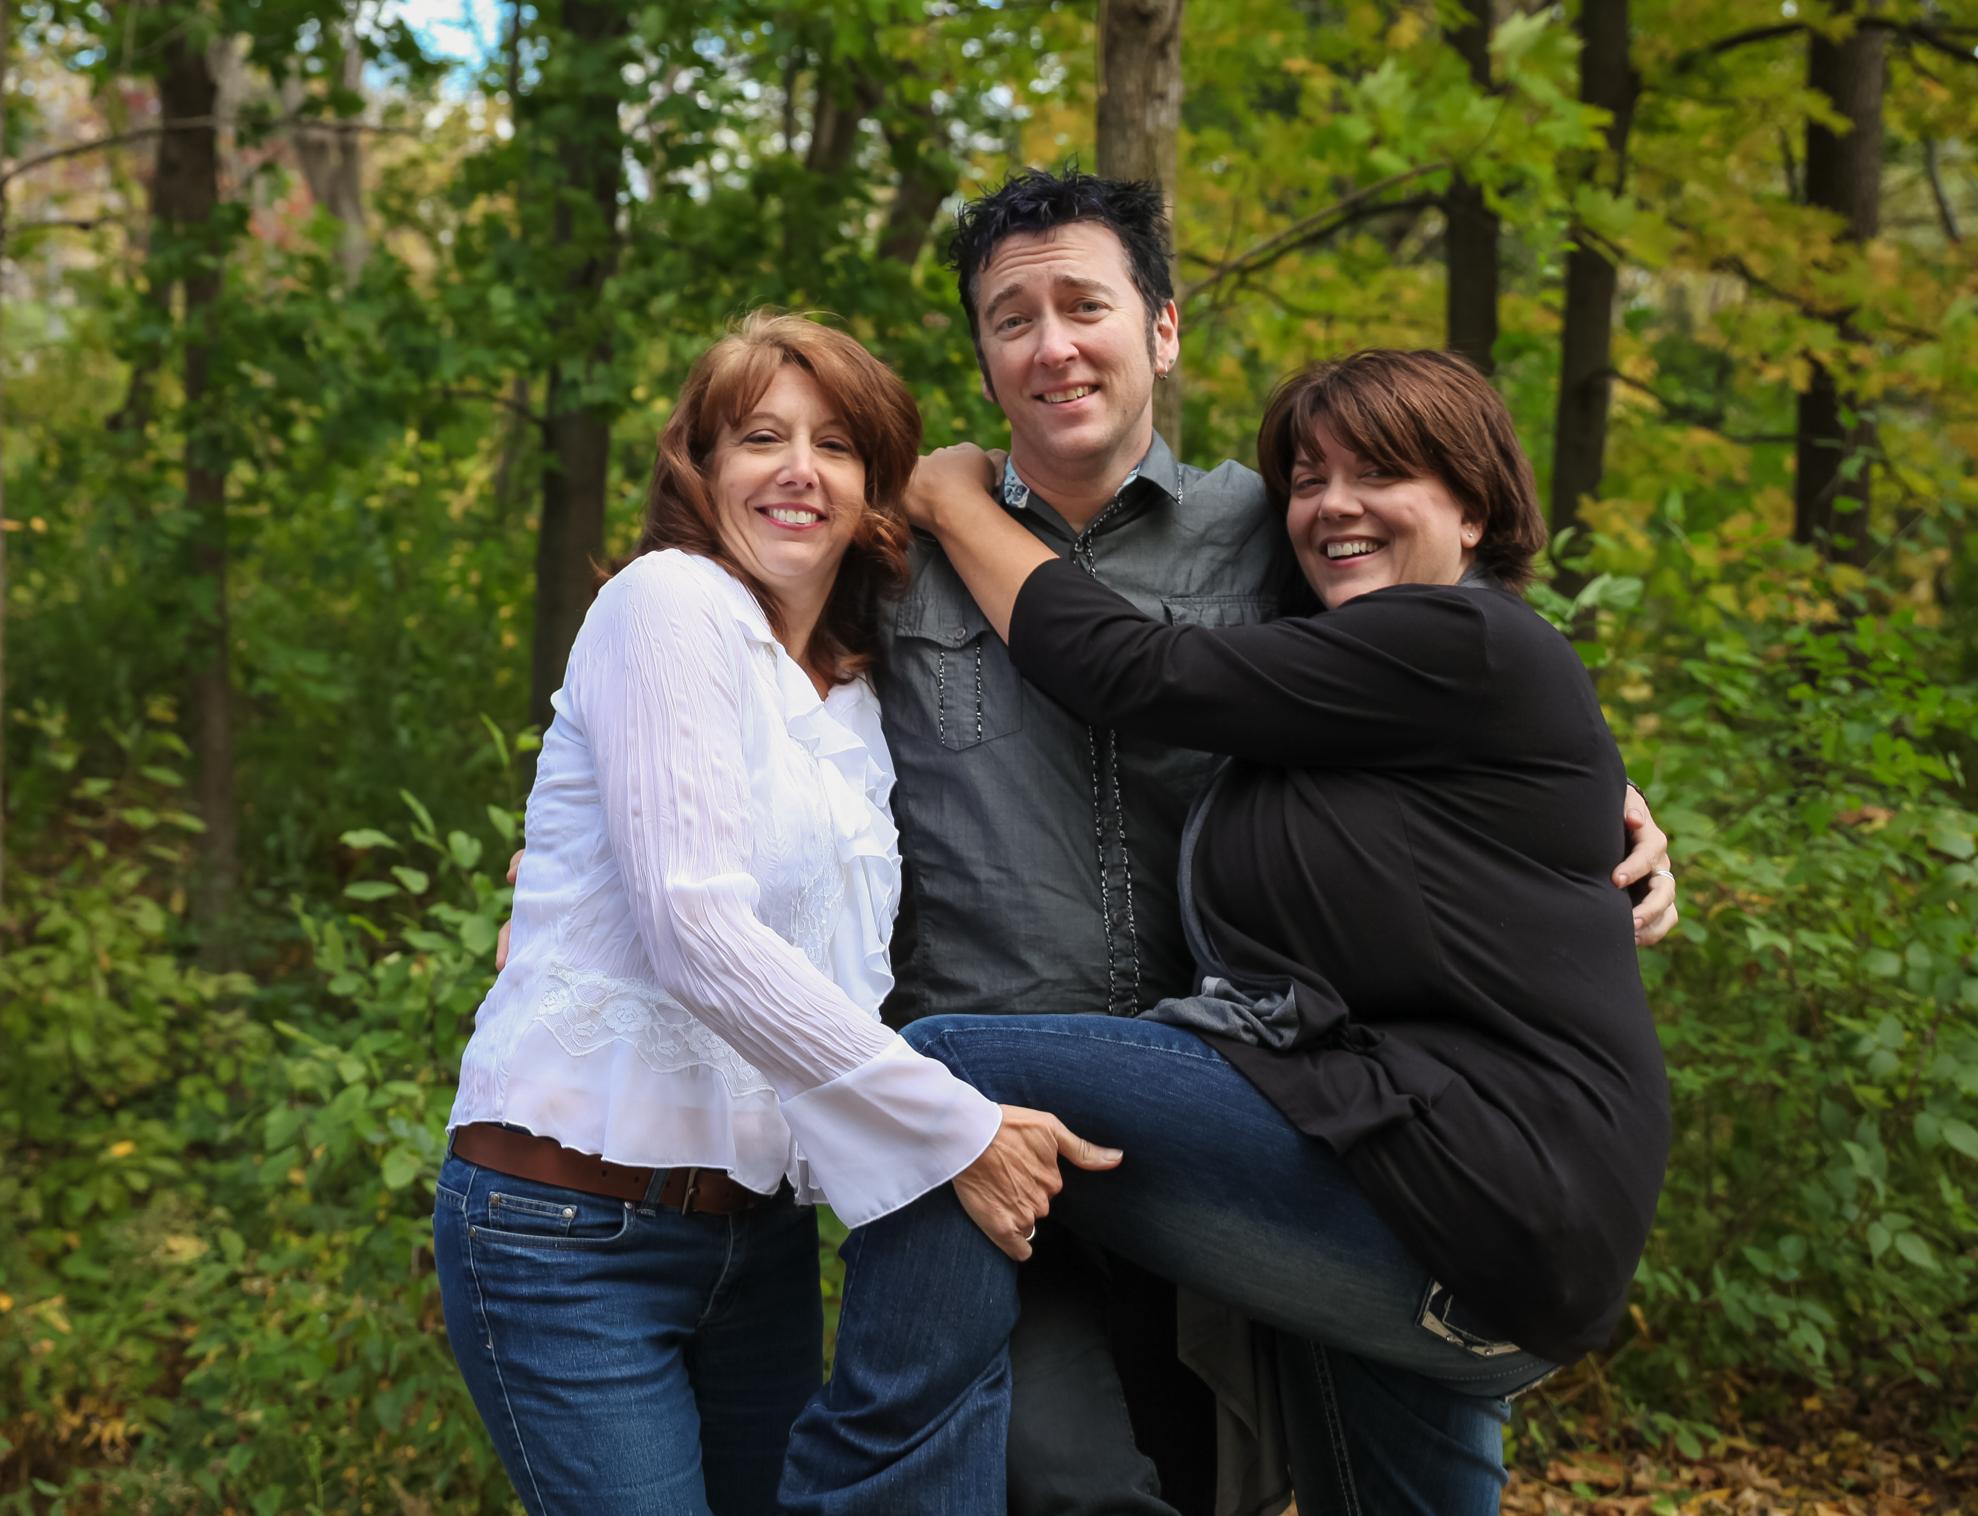 Pesch Family Portraits 2015 (79 of 83).jpg